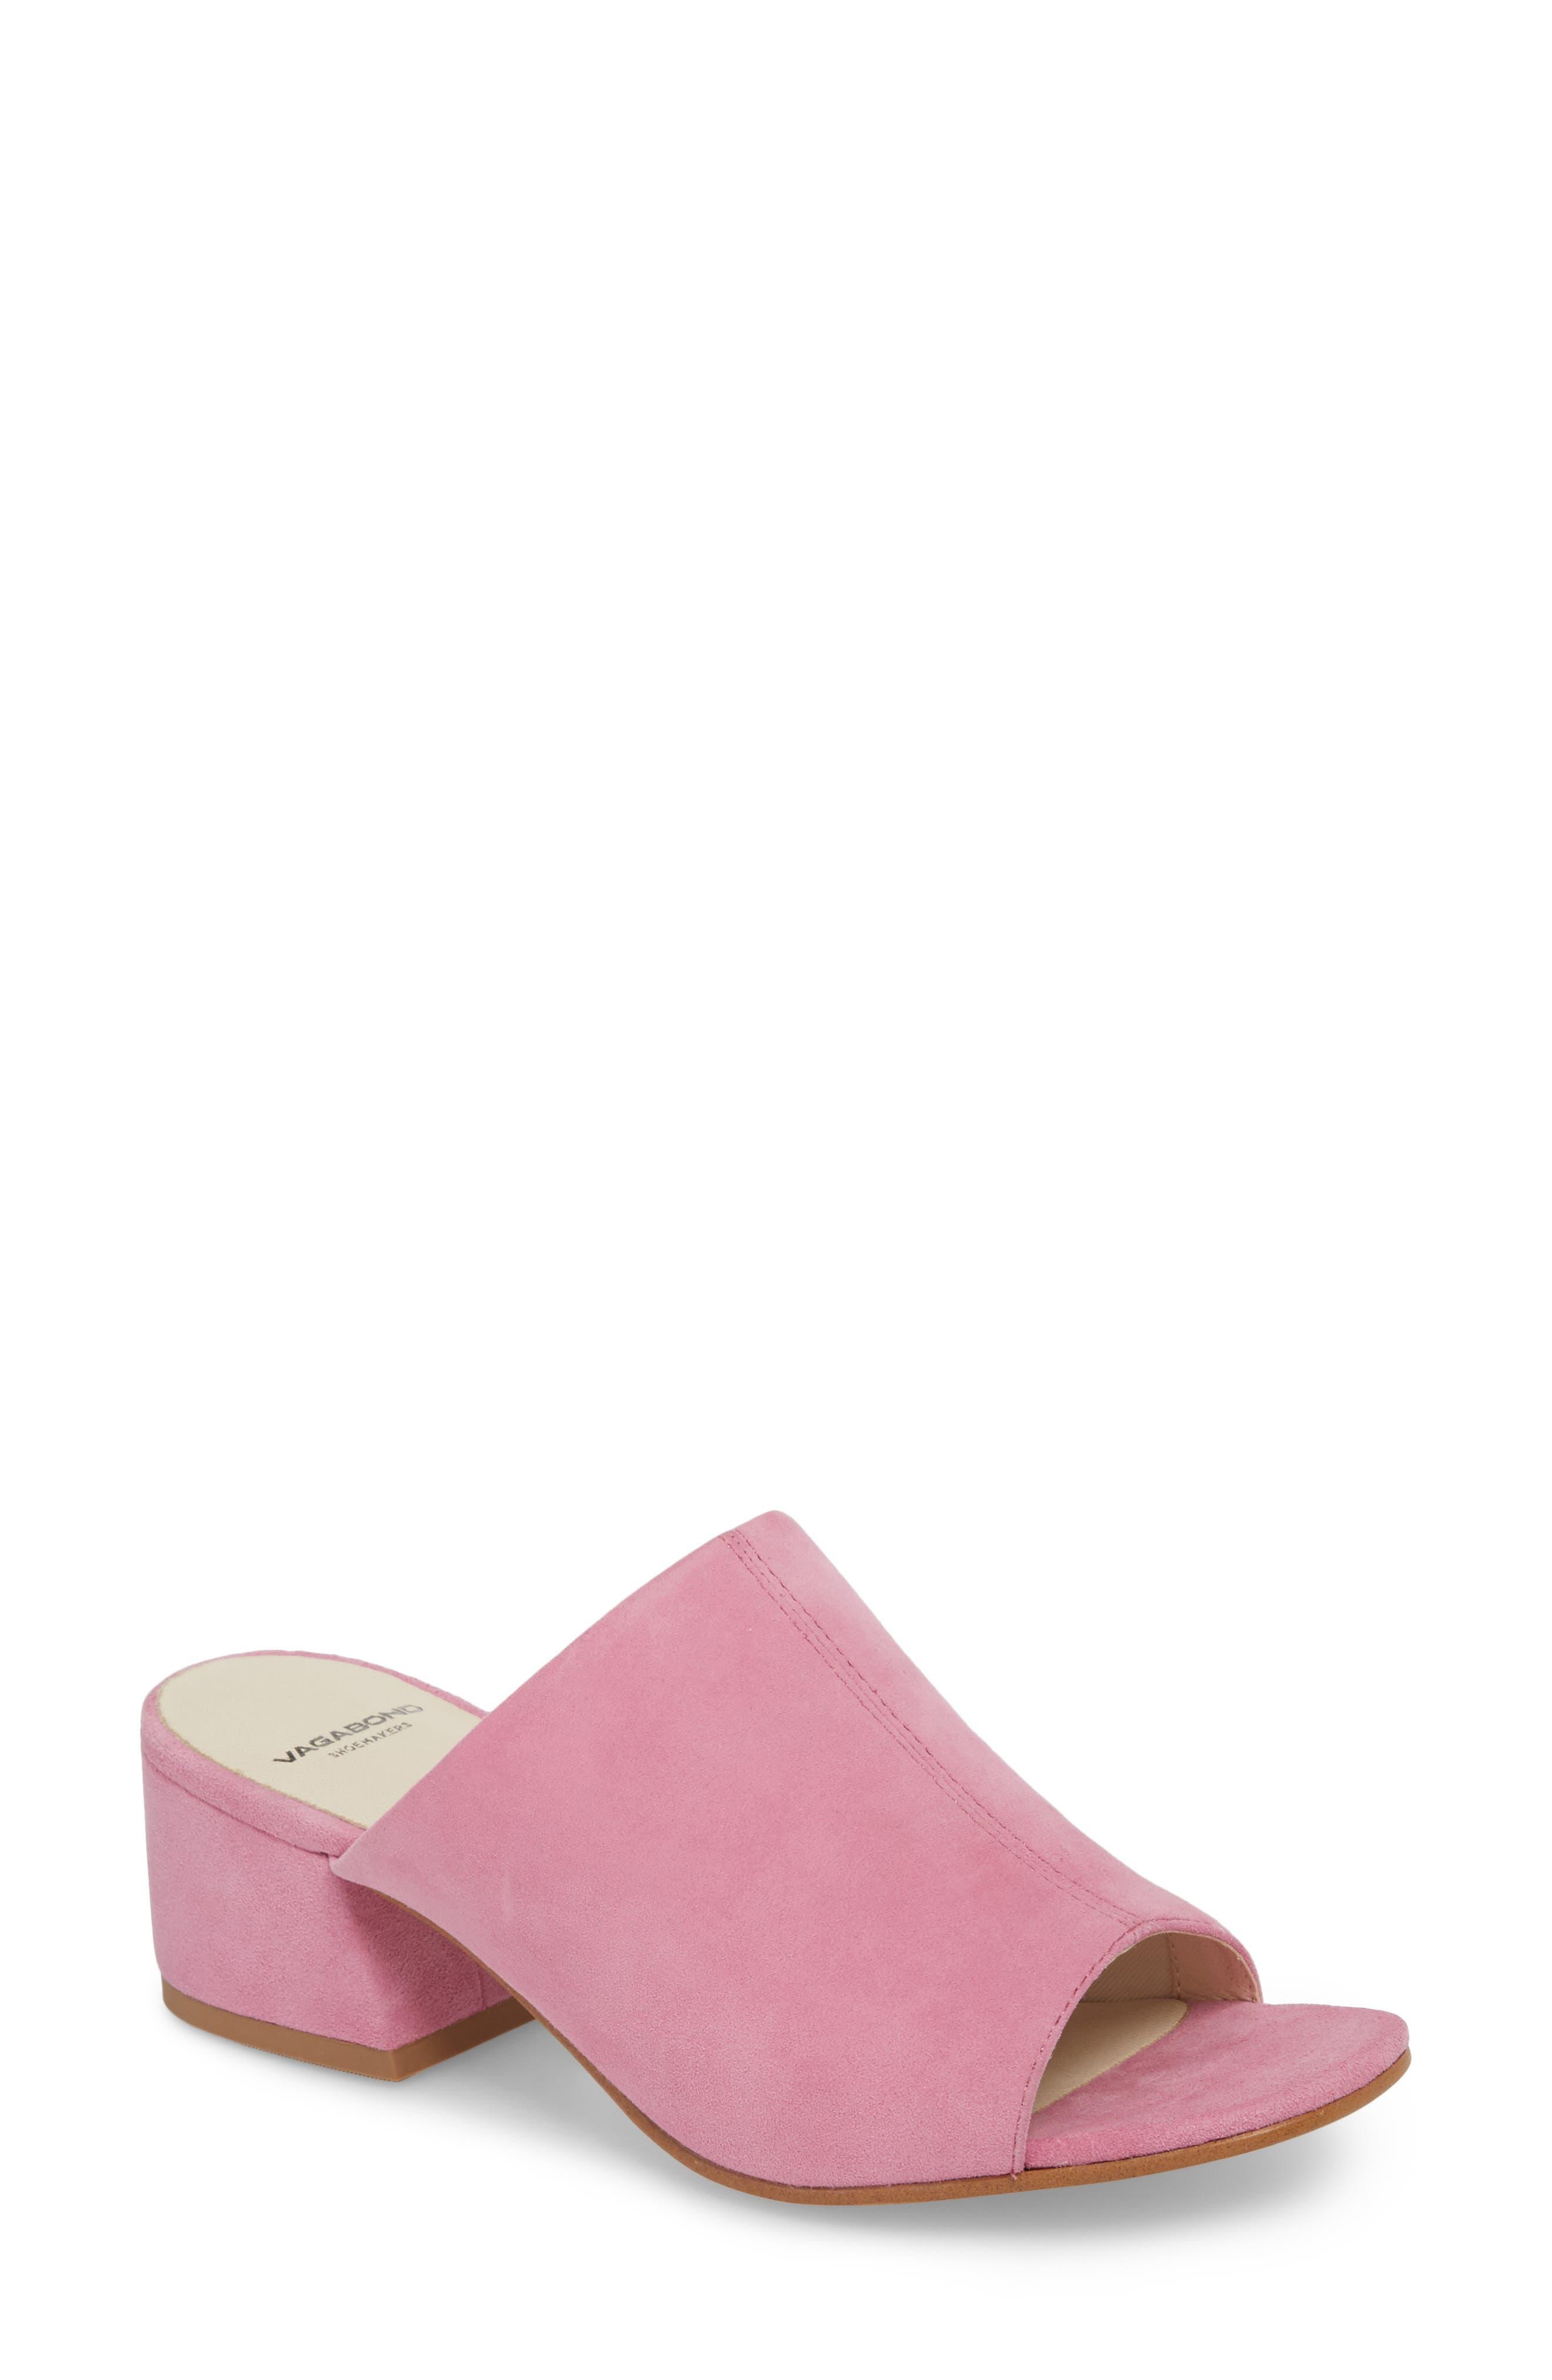 Saide Slide Sandal,                             Main thumbnail 1, color,                             Pink Suede